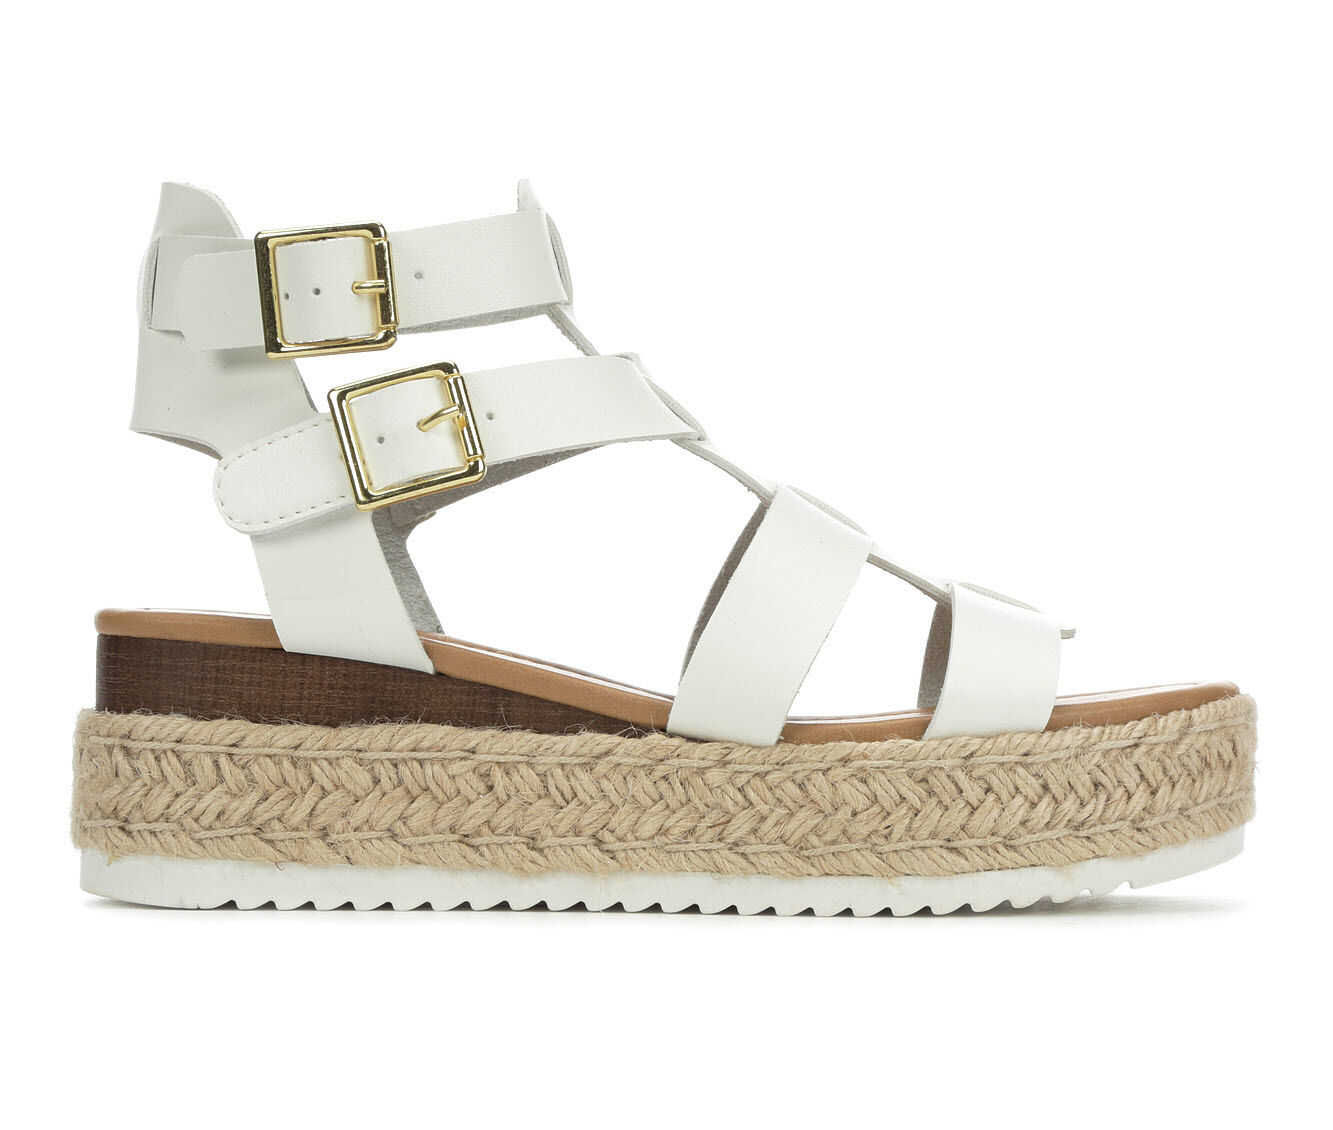 uk shoes_kd6846